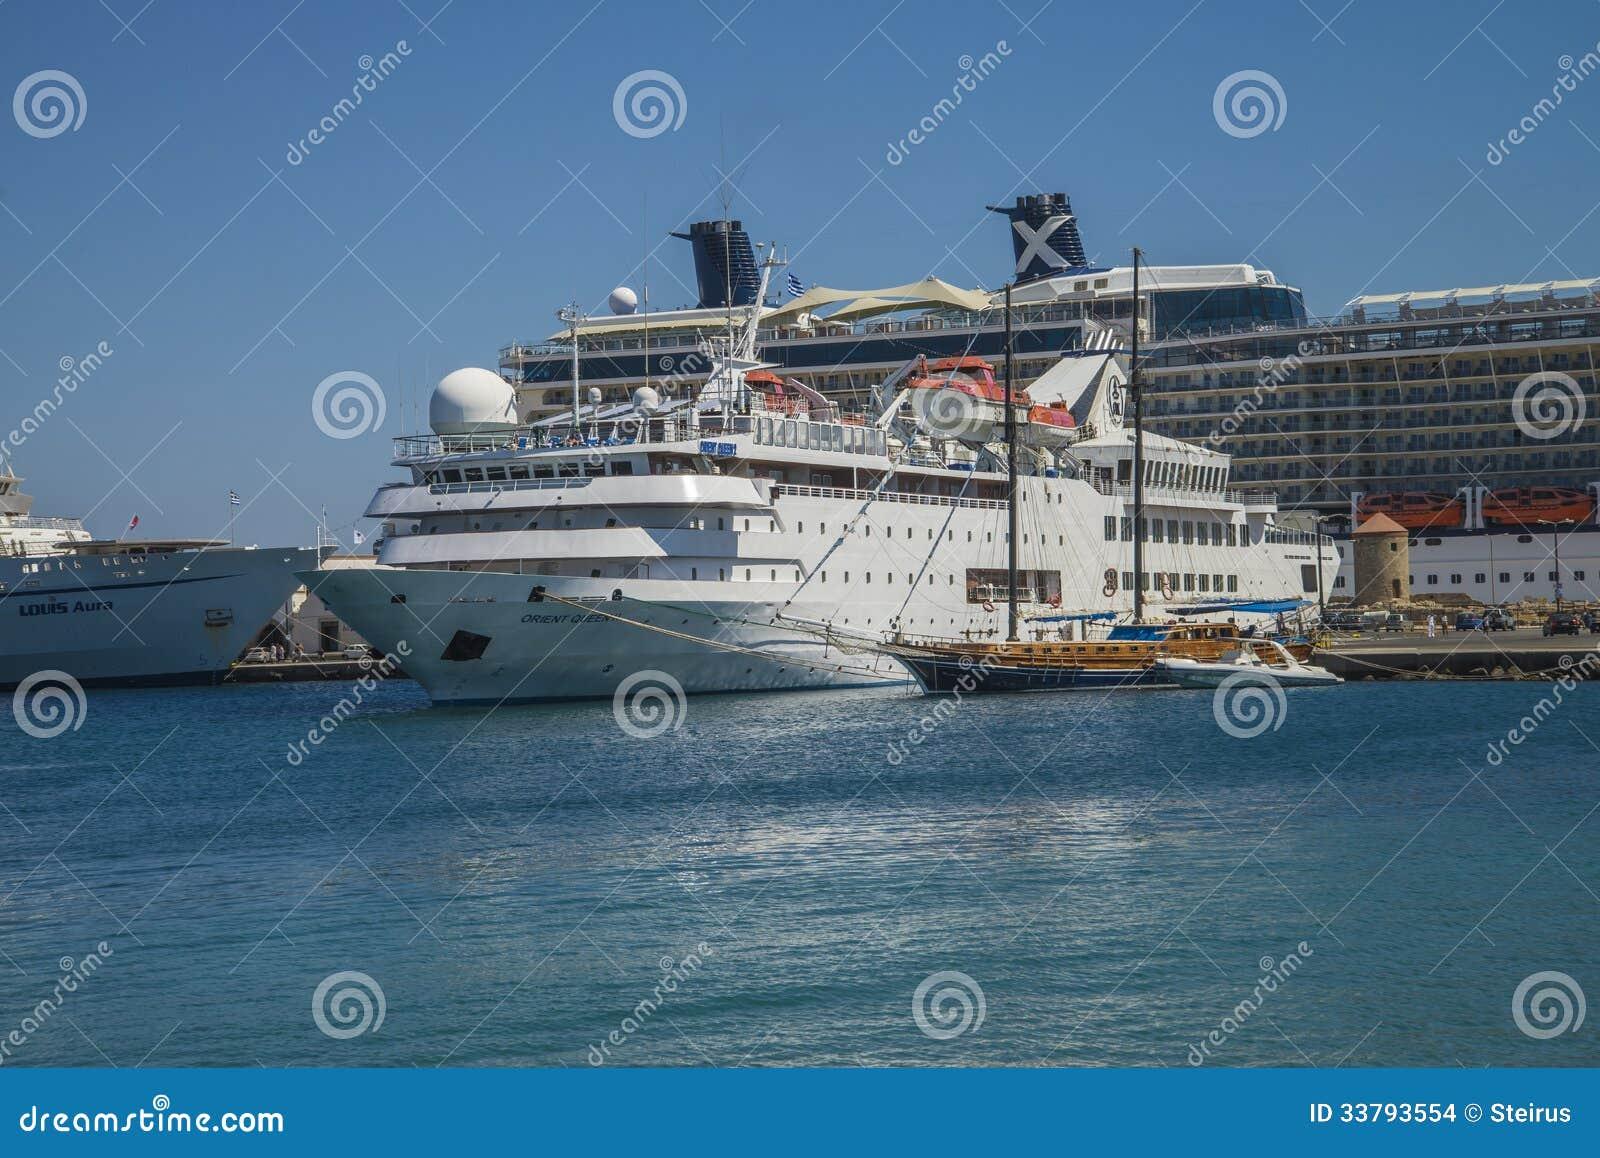 Cruise Ship In Mandraki Harbour Editorial Stock Image ...